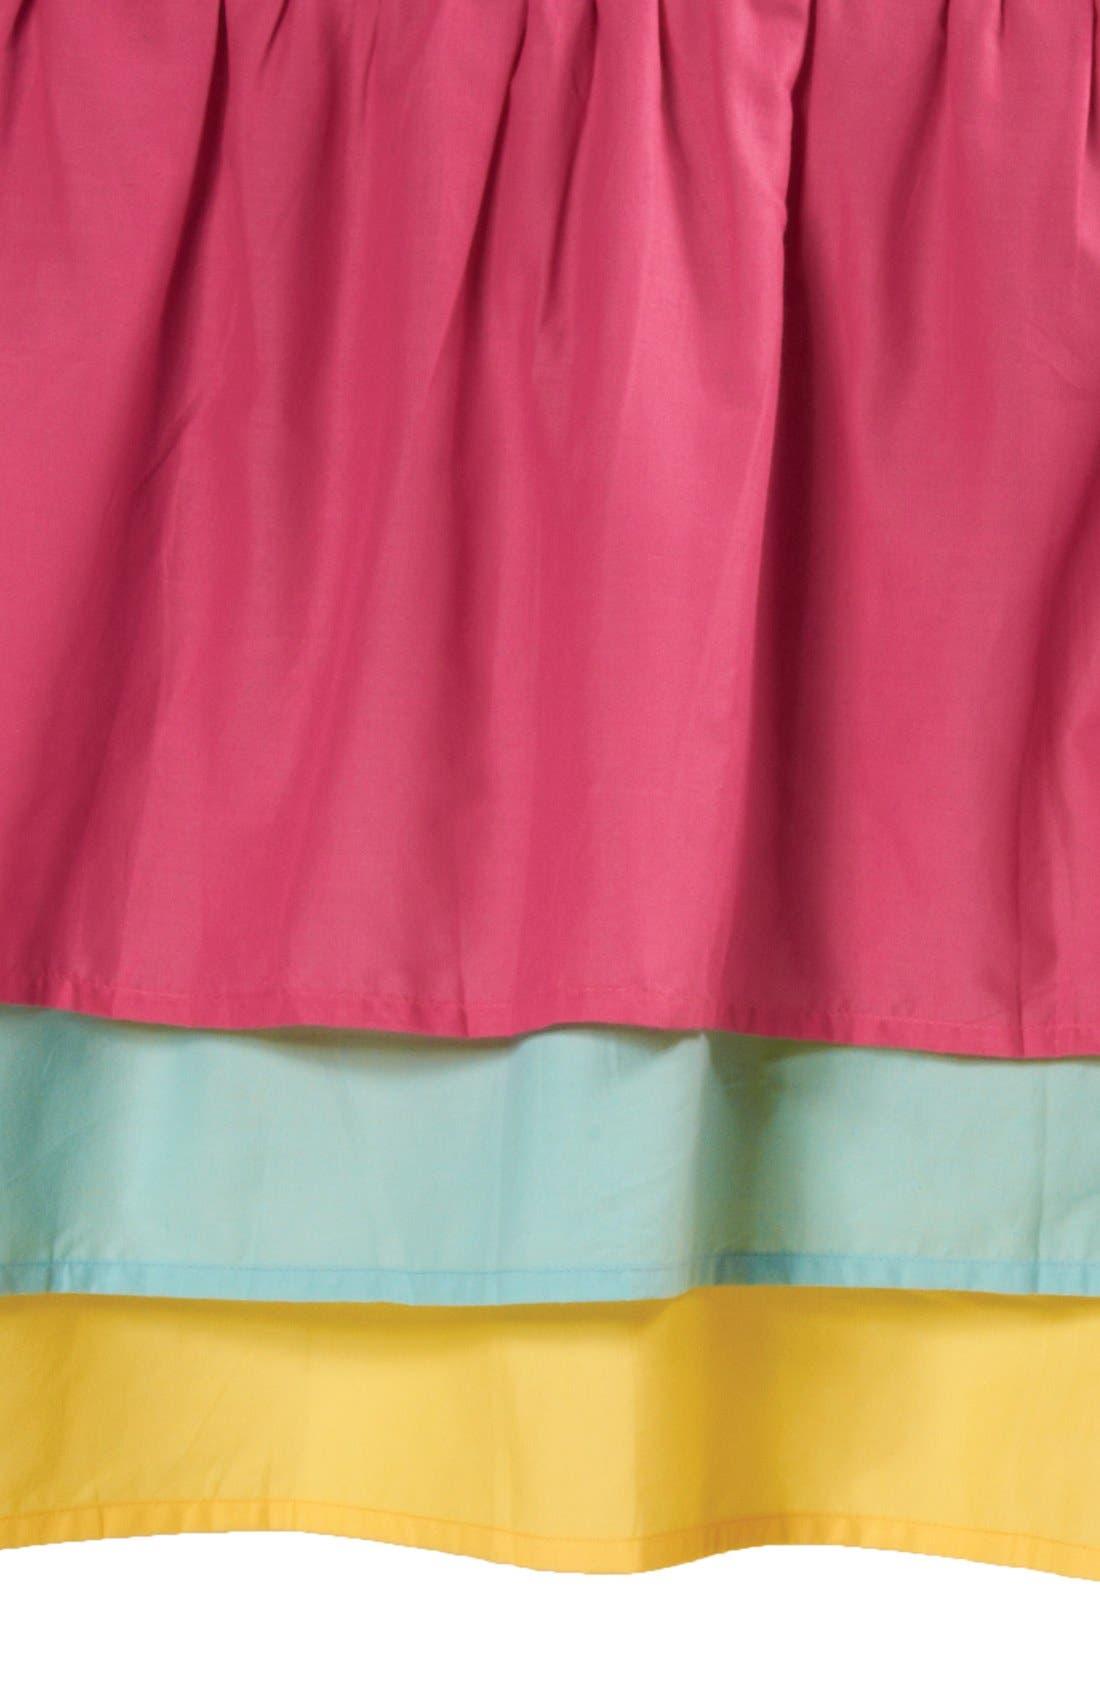 Main Image - Amity Home Ruffled Bed Skirt